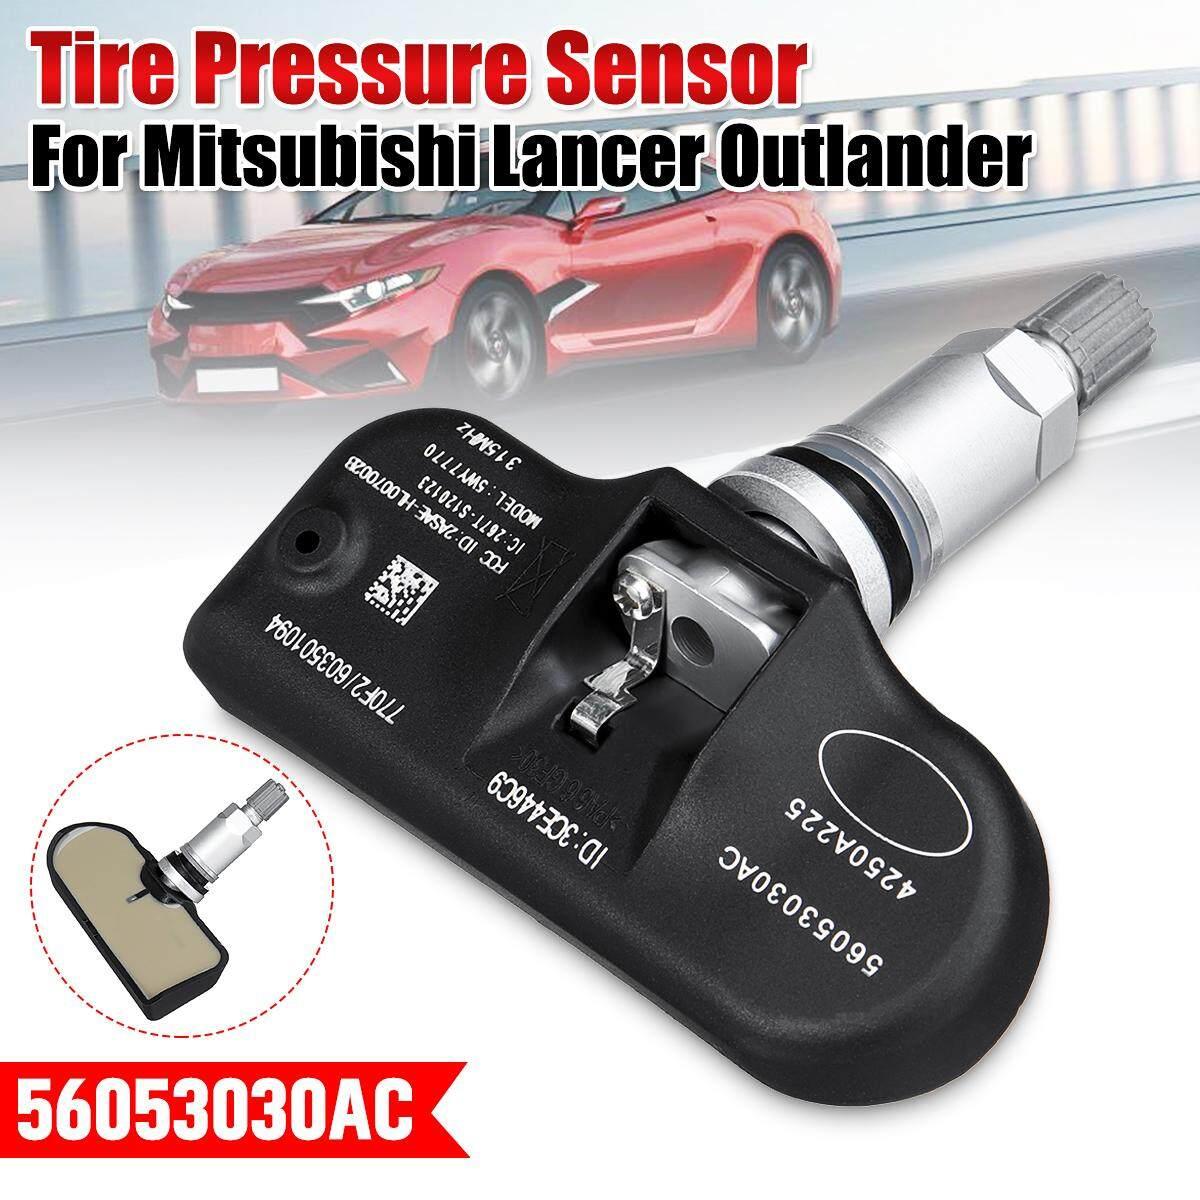 56053030AC 315MHZ Tire Pressure Sensor TPMS for Mitsubishi Lancer 2008-2010//Outlander 2007-2010 Tire Pressure Monitor Systems